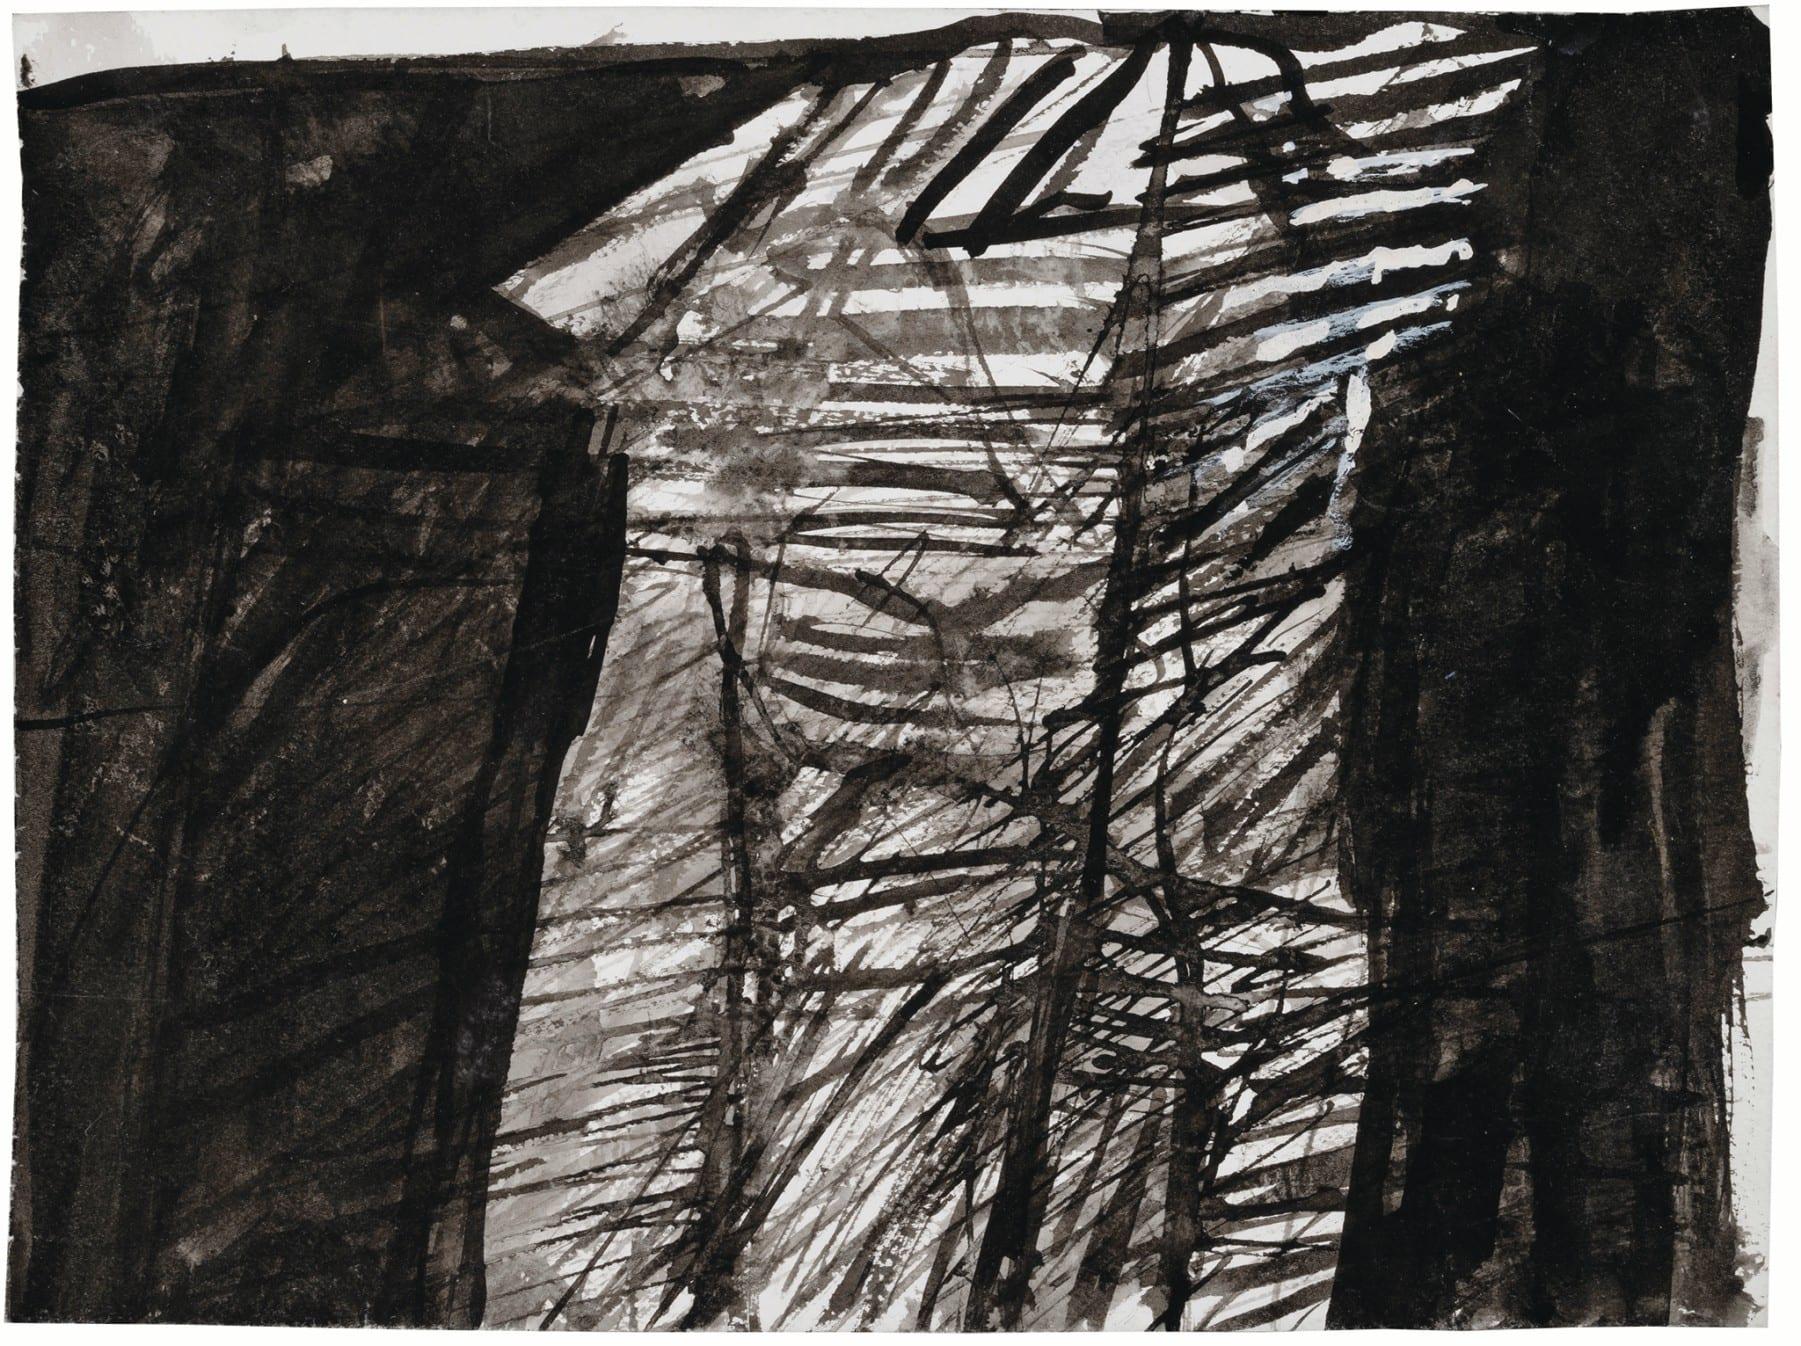 Sans titre by Colette Brunschwig